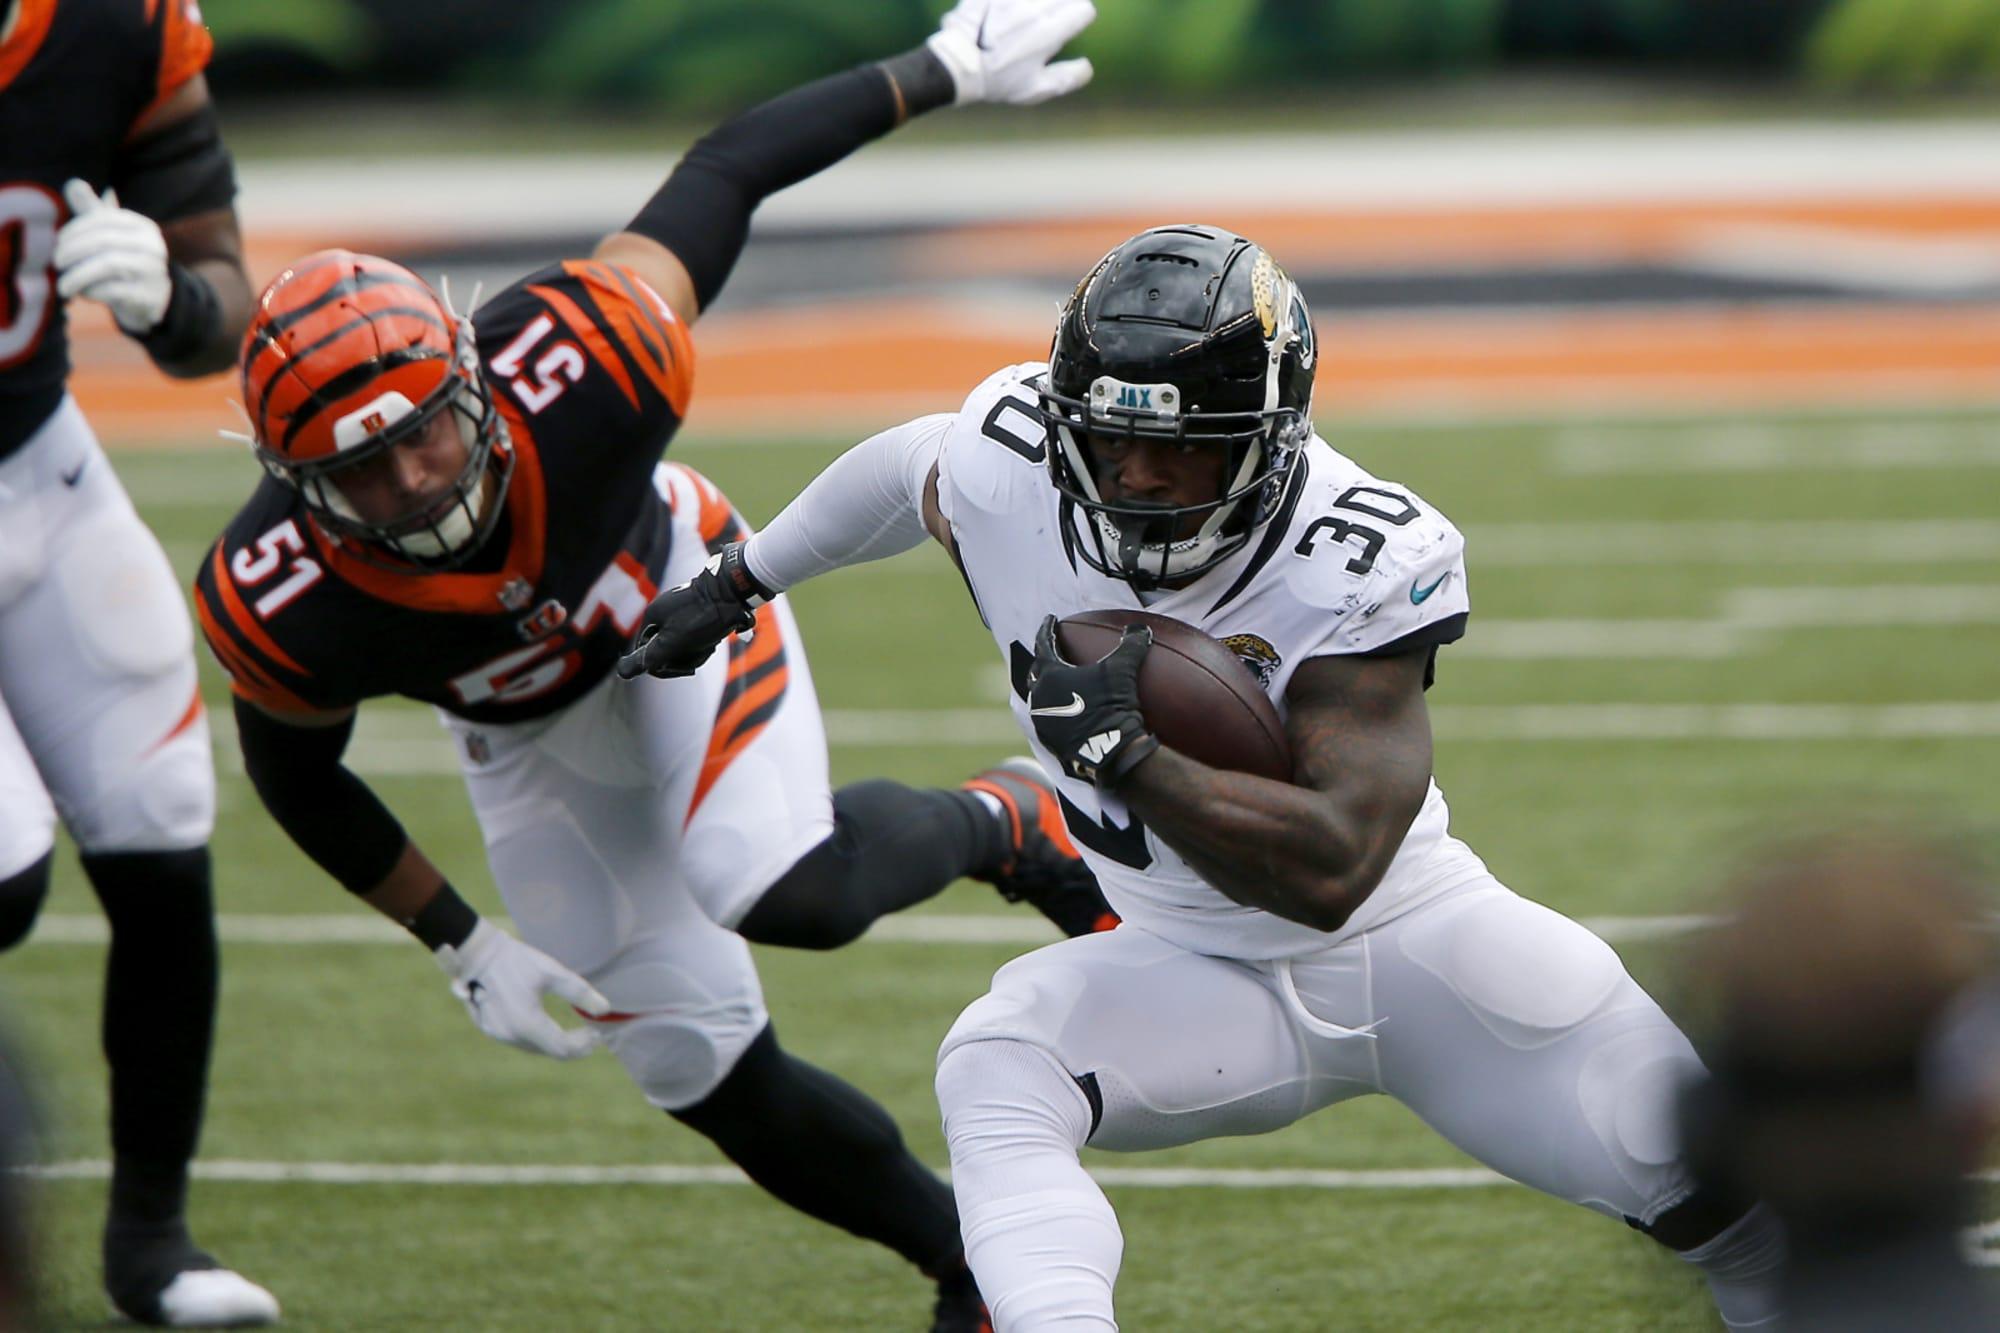 Jacksonville Jaguars 2020 draft class earns positive assessment